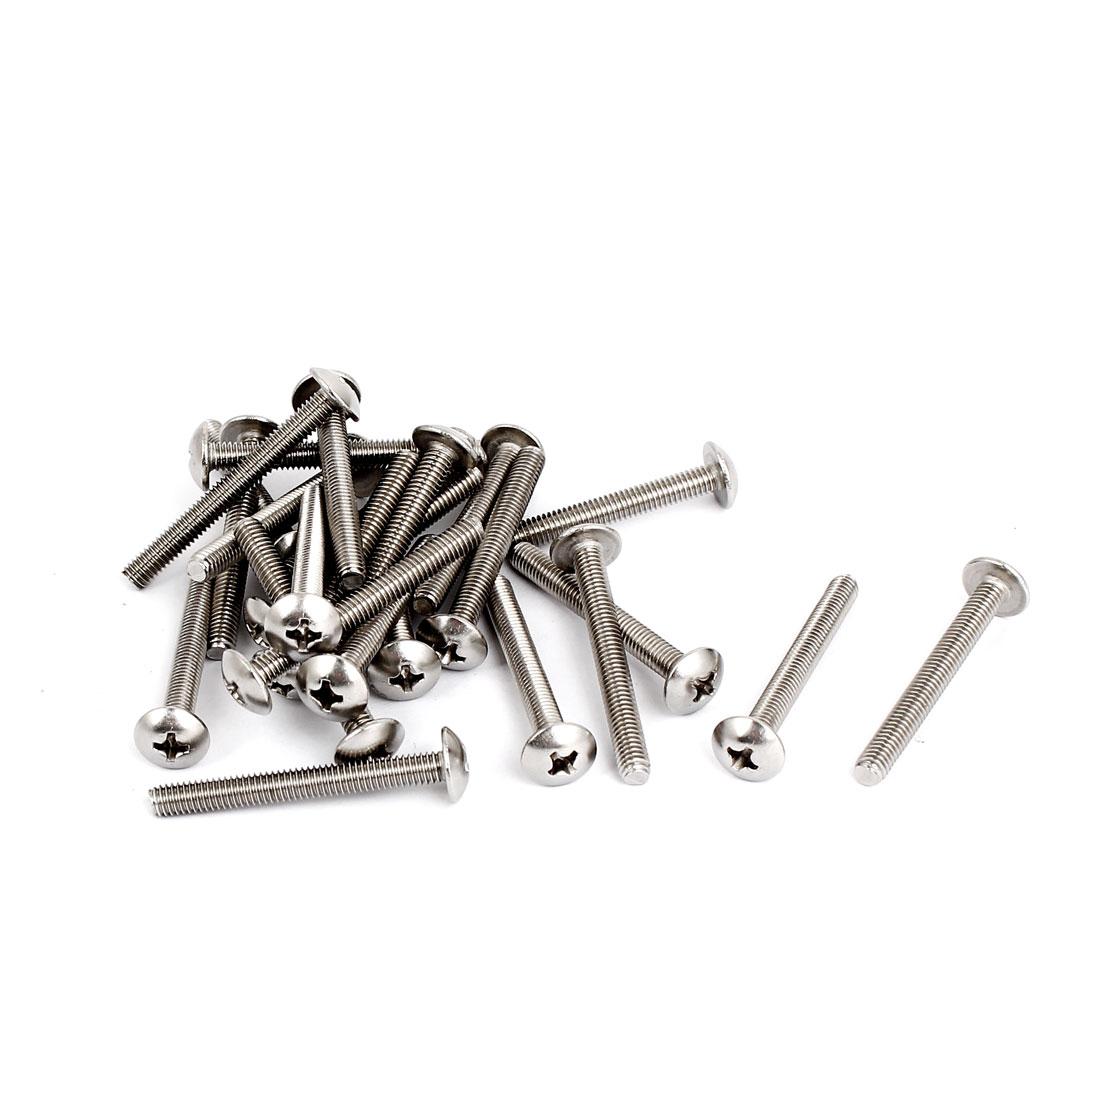 M4x35mm Stainless Steel Truss Phillips Head Machine Screws 25pcs